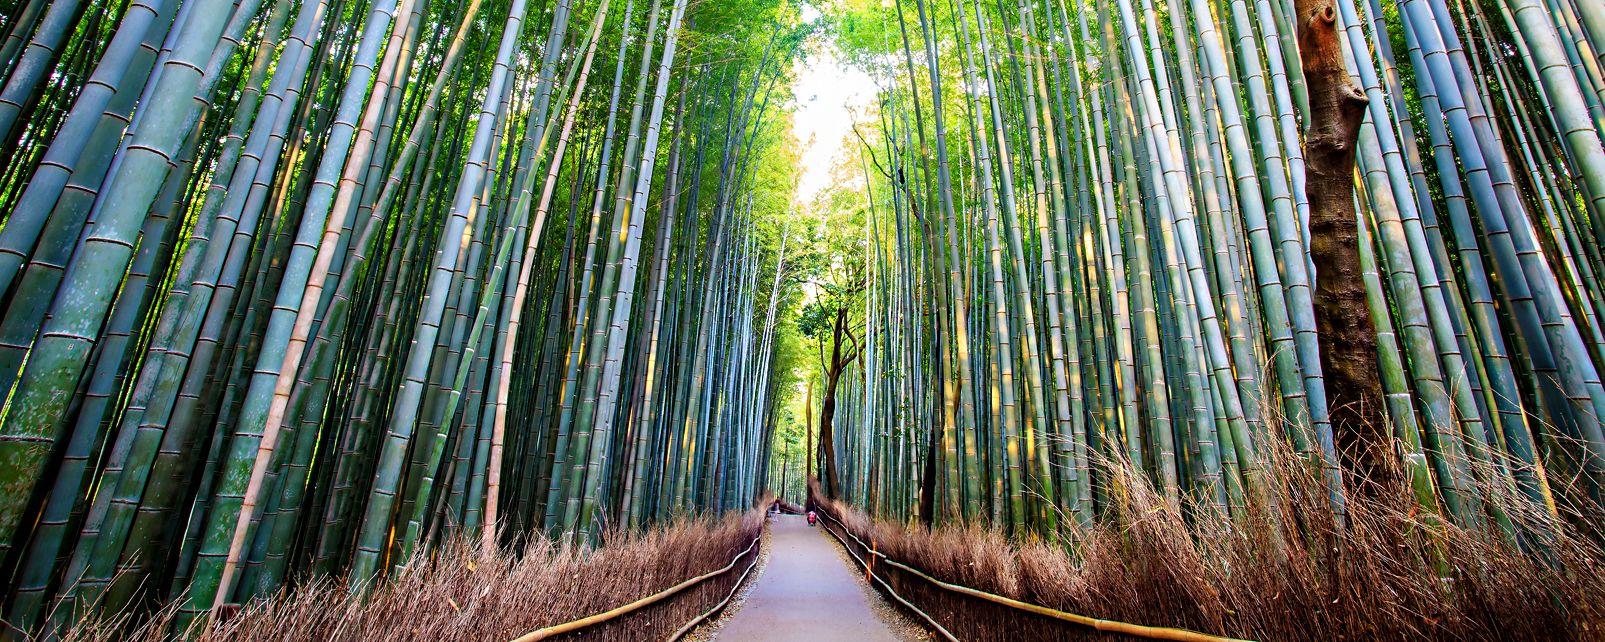 La bambouseraie d'Arashiyama à Kyoto , Japon